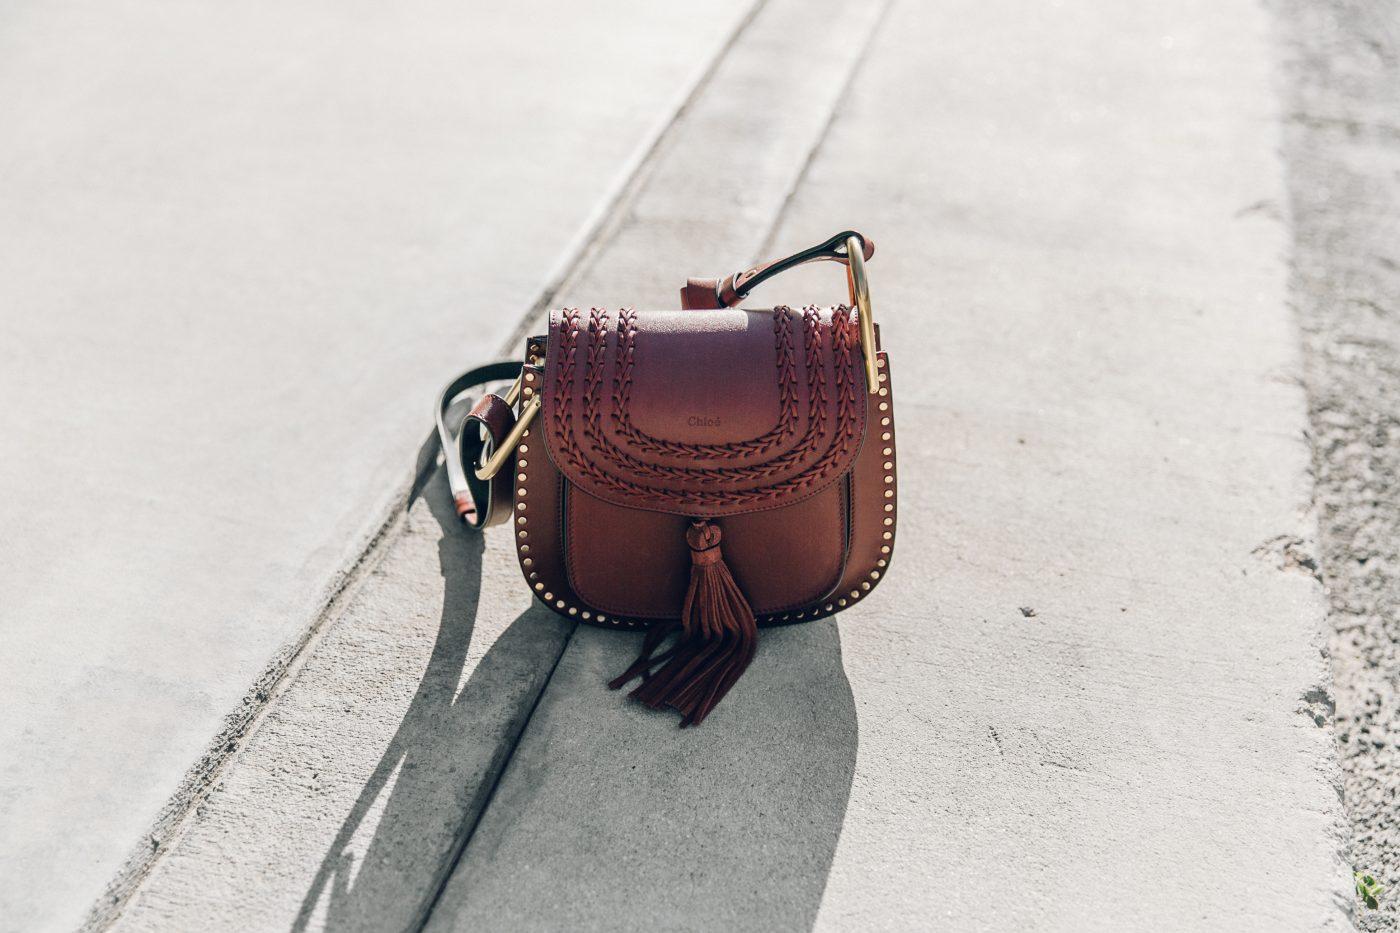 Denim_Jacket-Saint_Laurent-Chloe_Top-Suede_Skirt-Chloe_Hudson_Bag-Espadrilles-Coachella-Palm_Springs-Outfit-Collage_Vintage-61